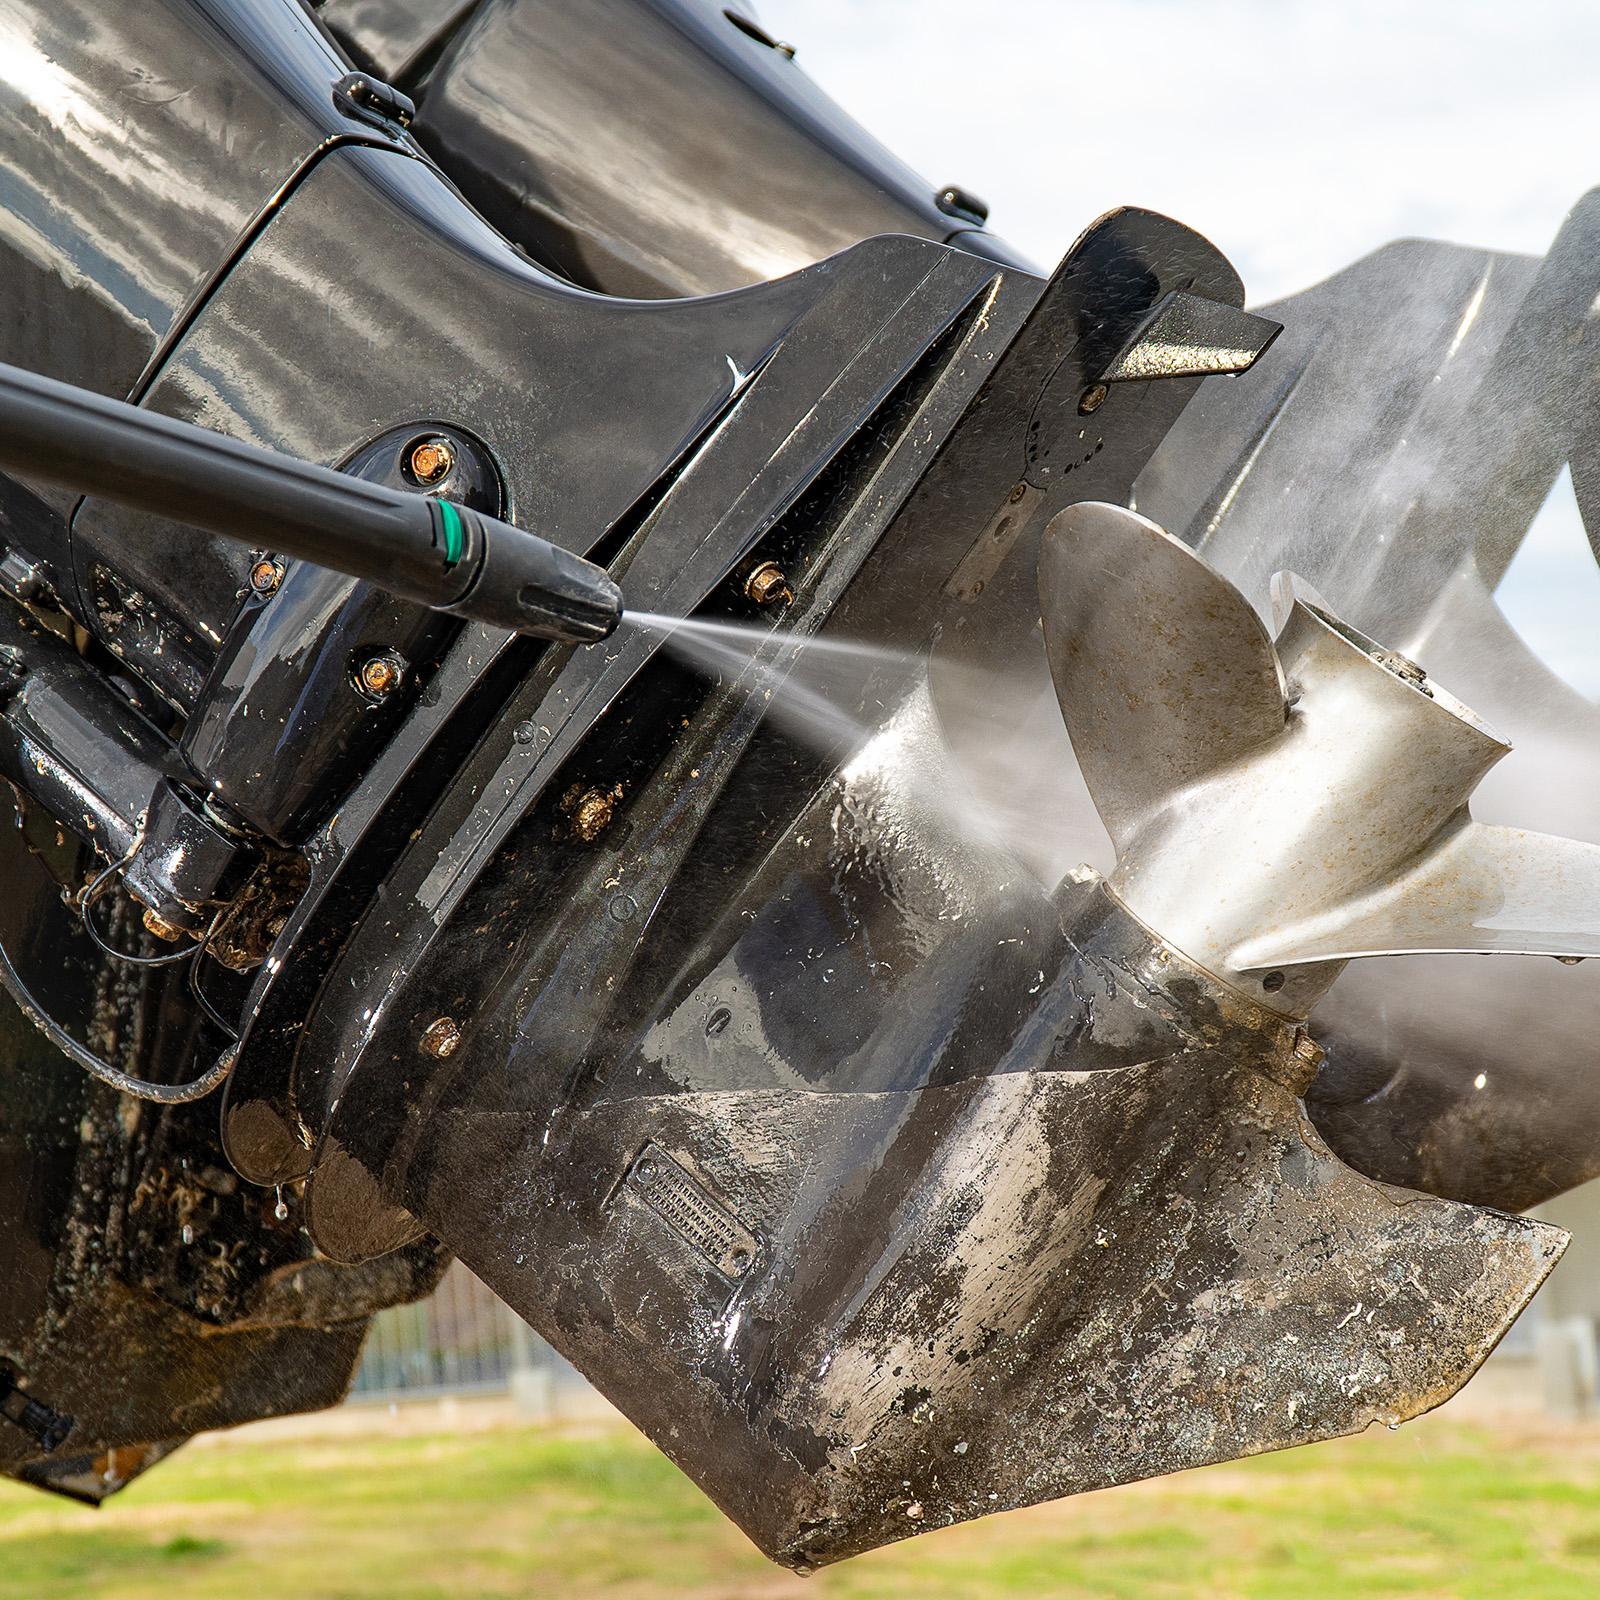 Gerni Jet Spray Nozzle - Boat Outboard Motor Propeller